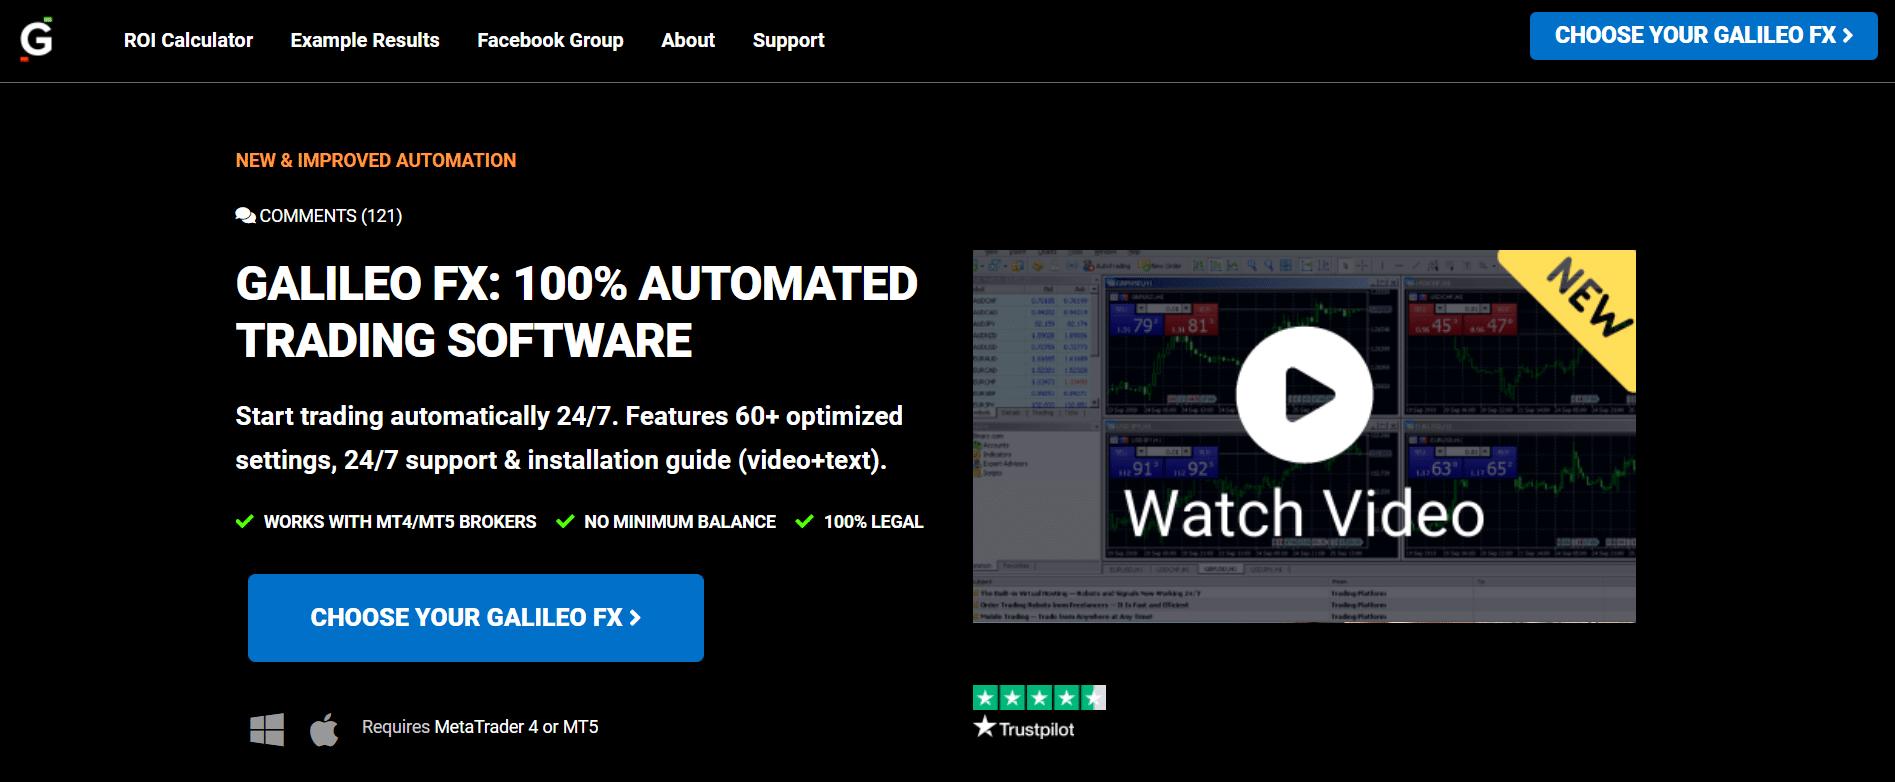 Galileo FX presentation